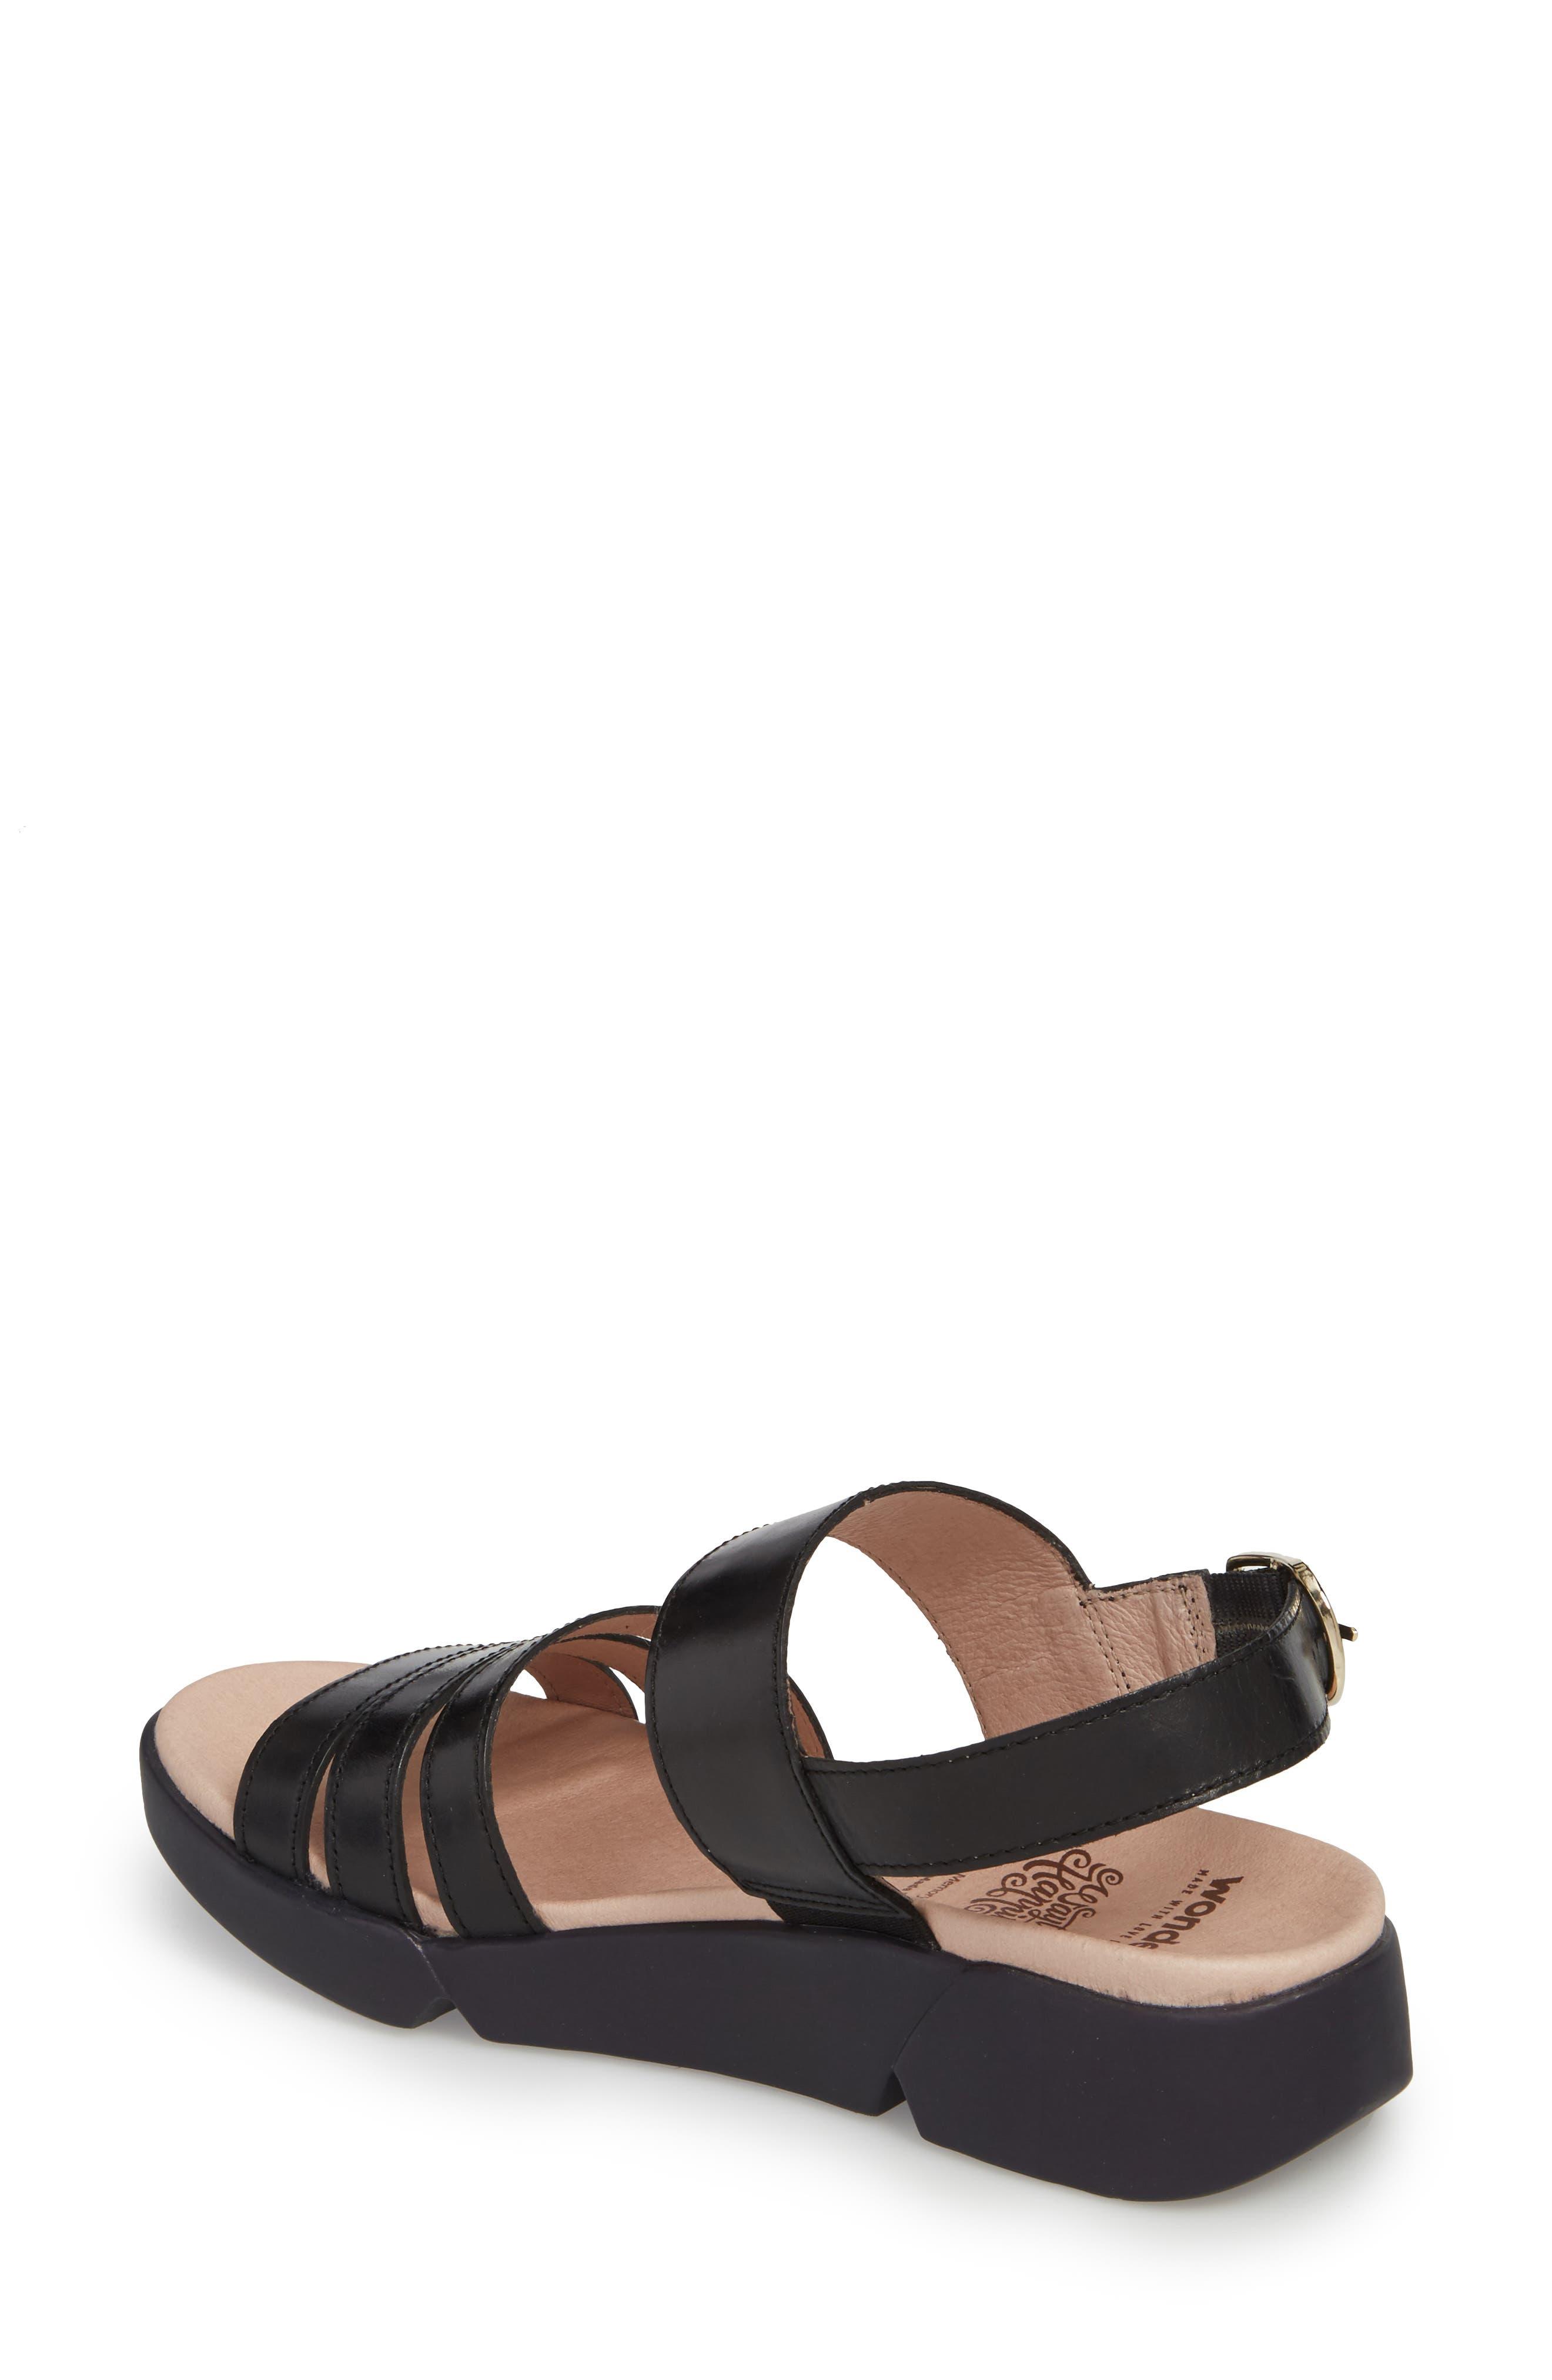 A-8004 Sandal,                             Alternate thumbnail 2, color,                             Black Leather